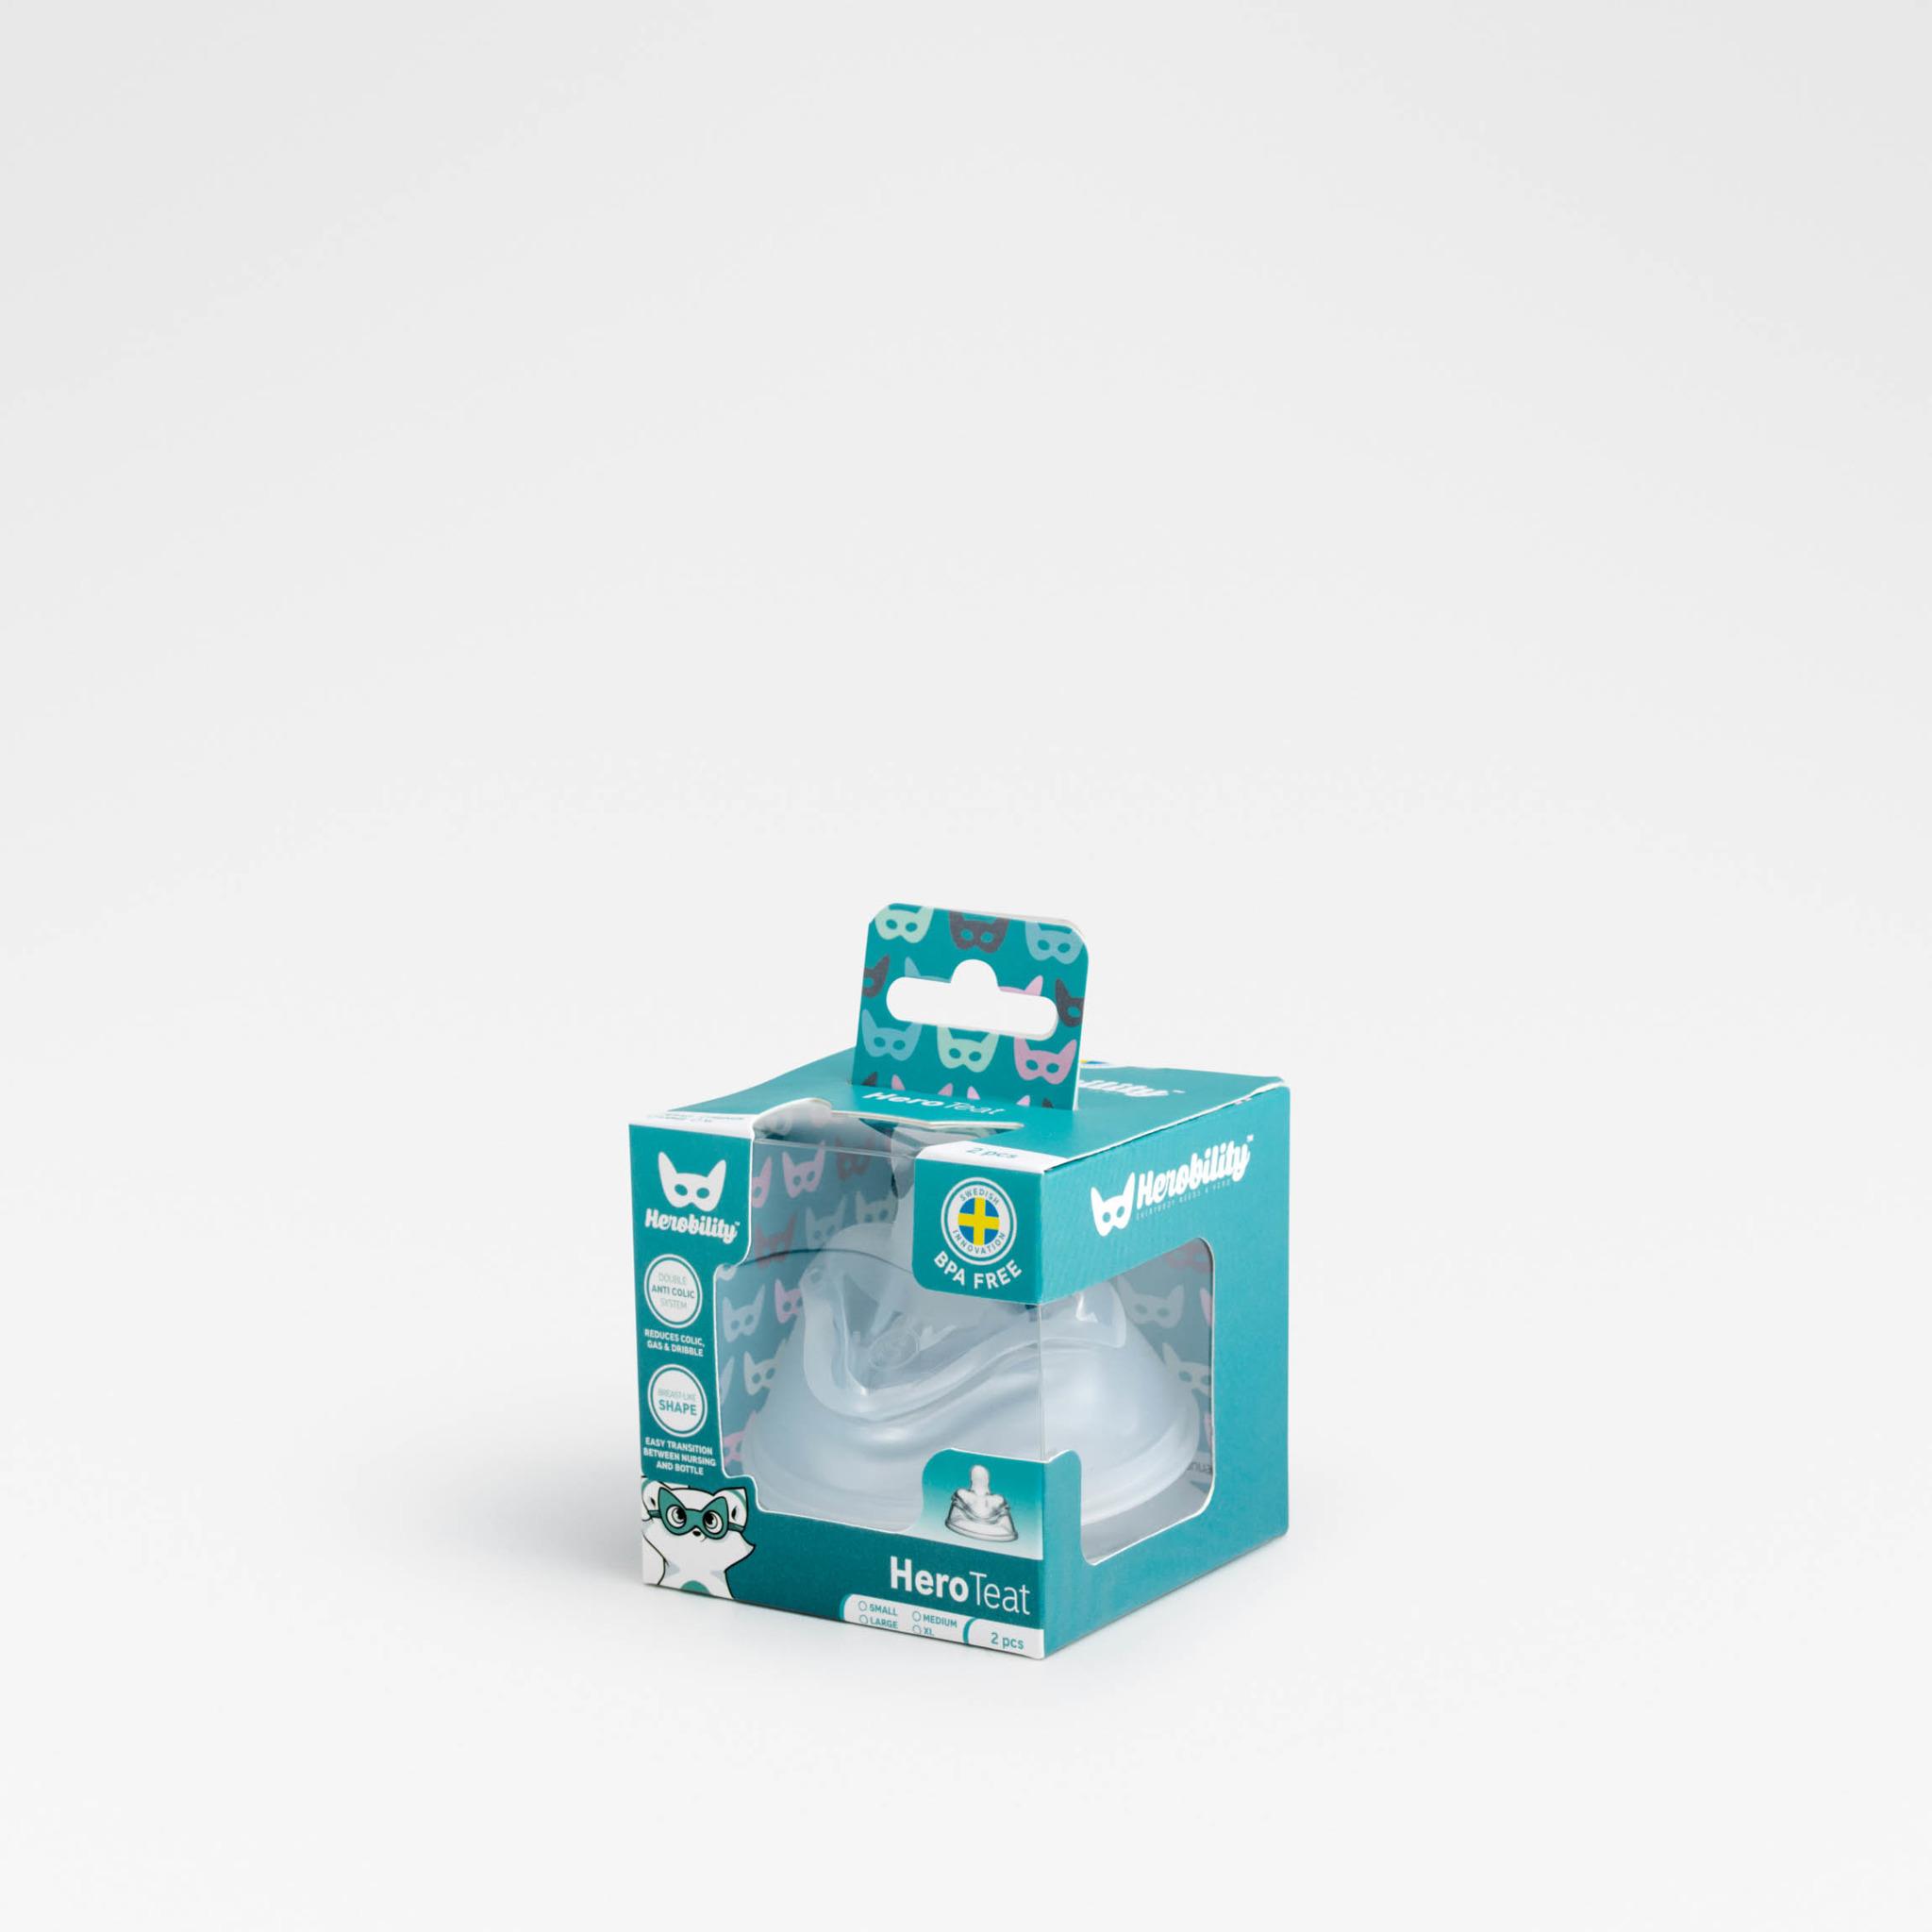 Herobility - smoczek antykolkowy HeroTeat, L (4 m+), 2 szt.